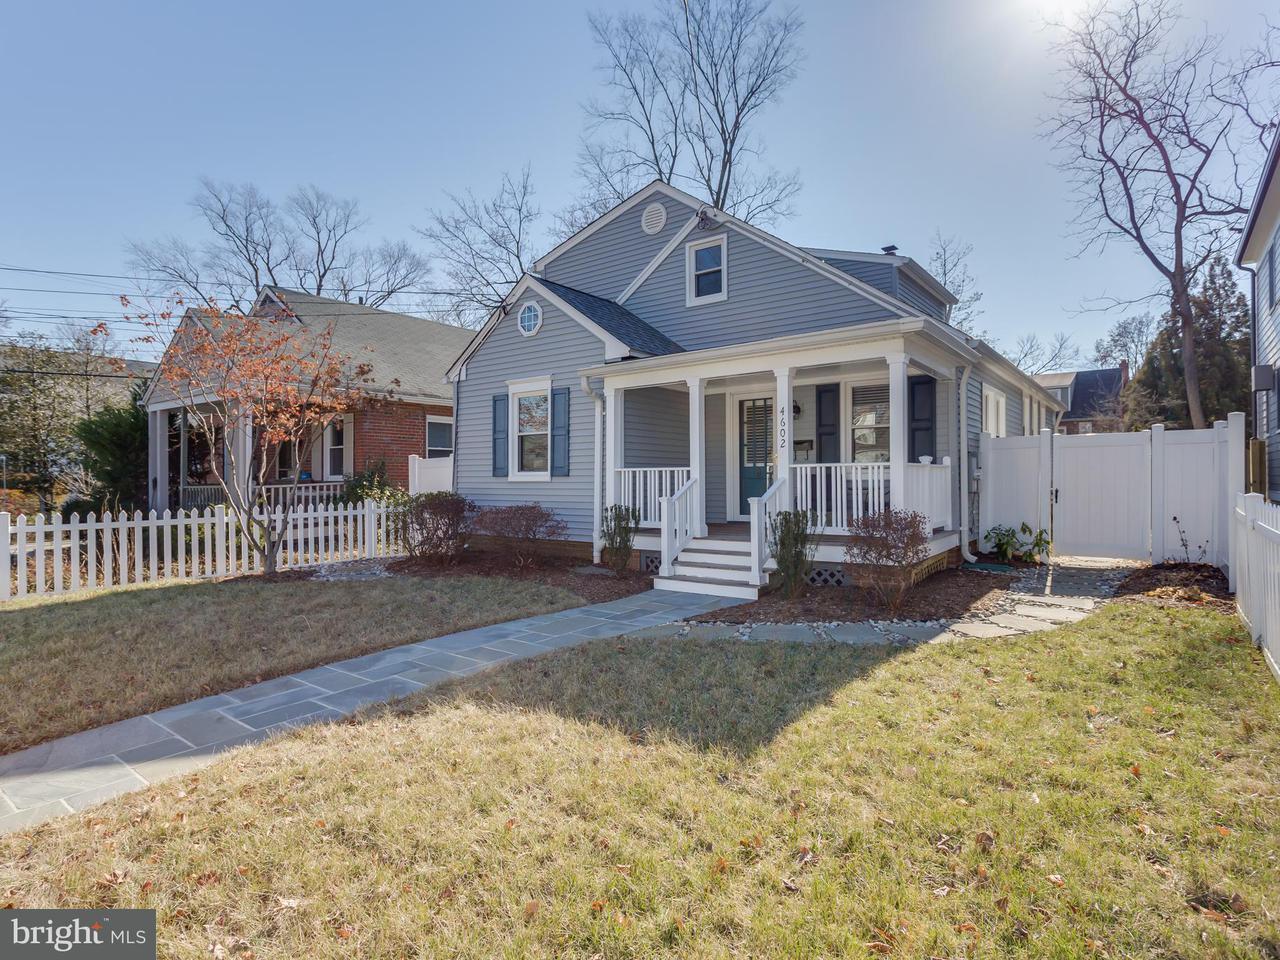 Single Family Home for Sale at 4602 Chestnut Street 4602 Chestnut Street Bethesda, Maryland 20814 United States